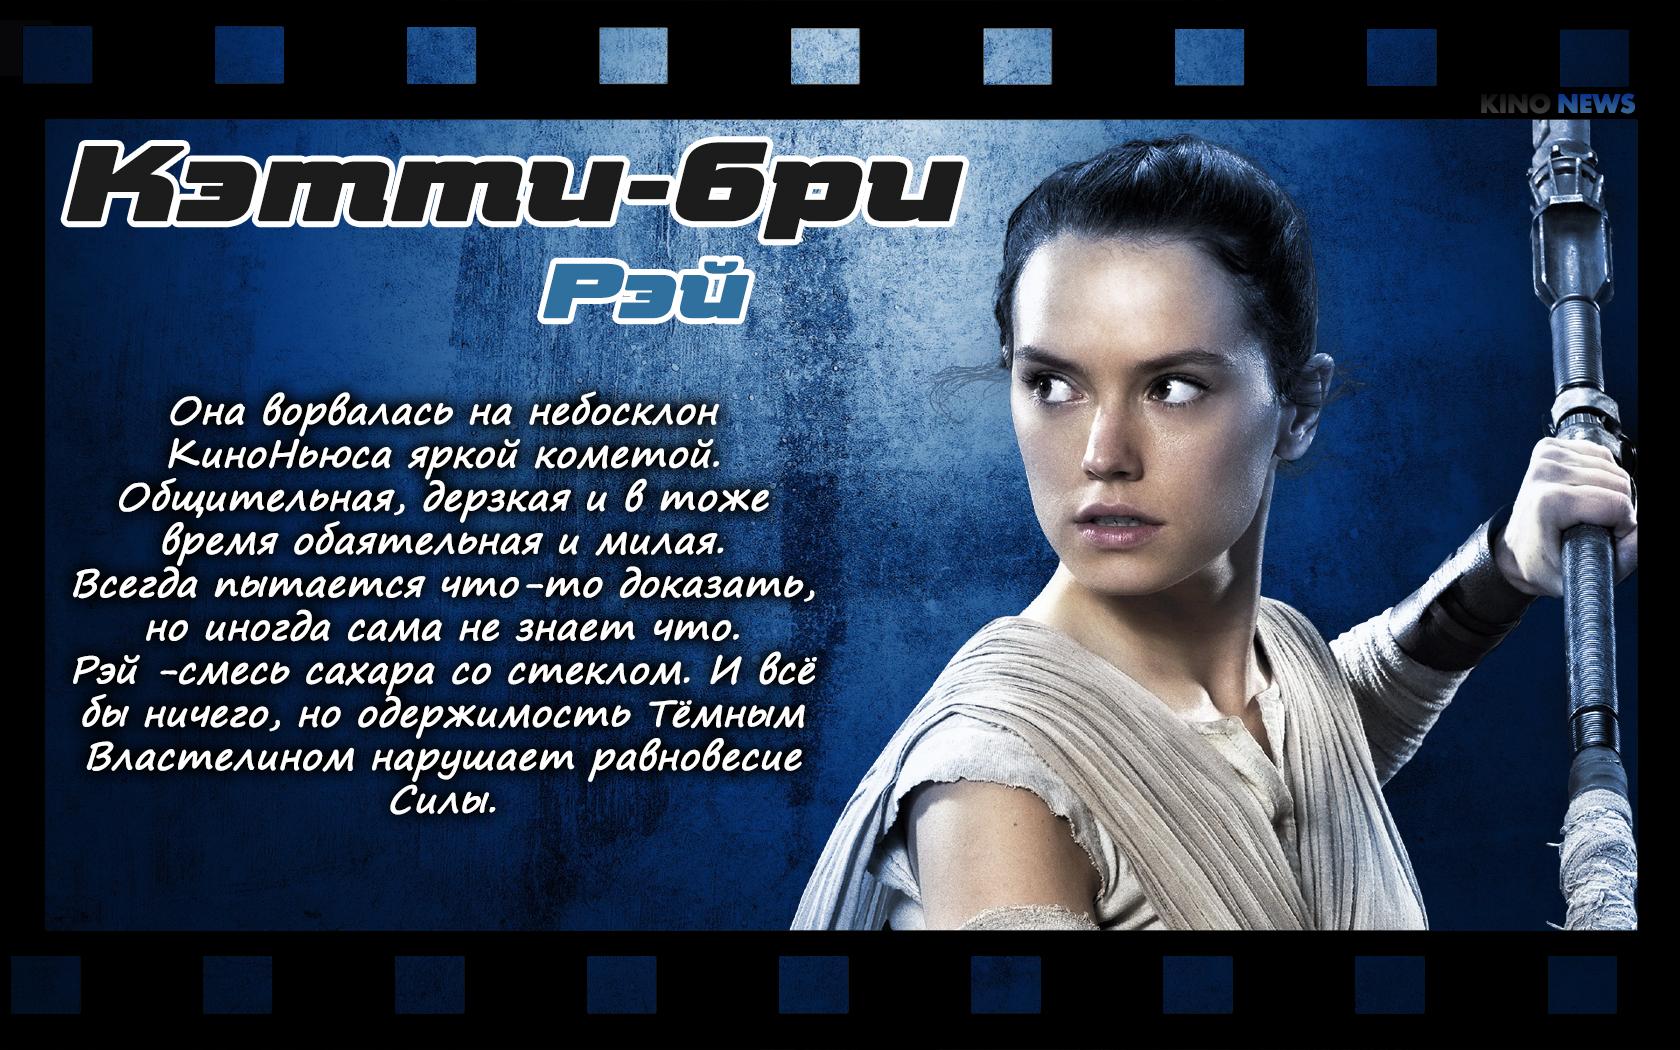 https://www.kinonews.ru/insimgs/2017/persimg/persimg77944_63.jpg